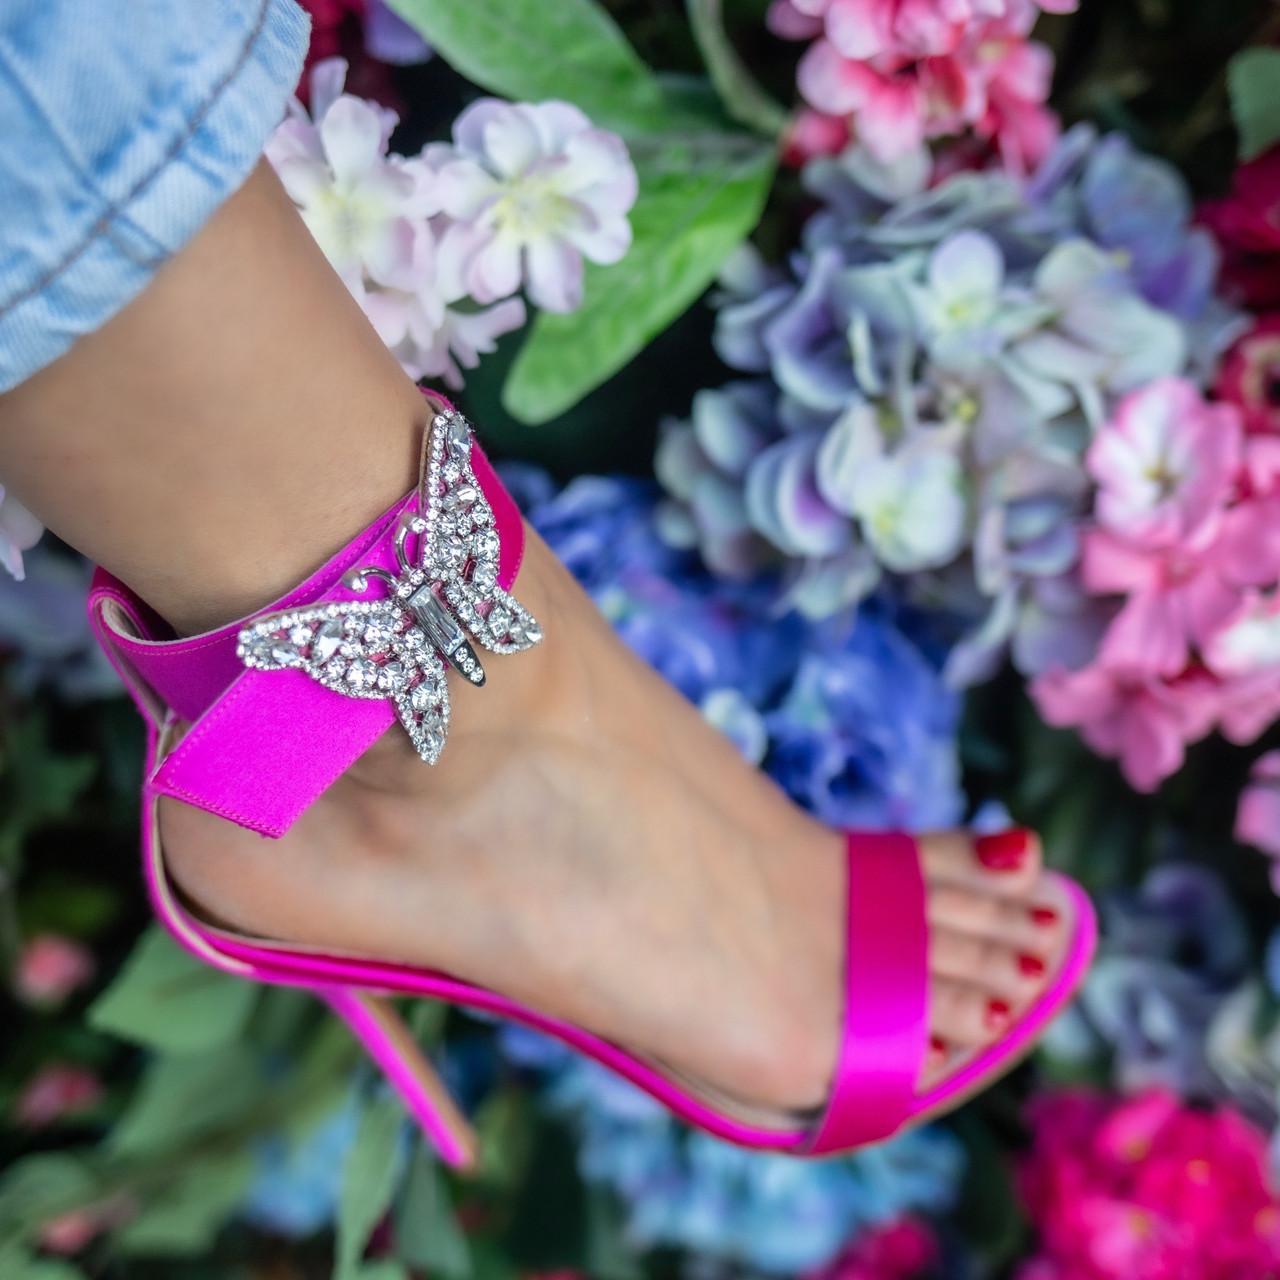 Portofino Embellished Neon Pink Satin Heel Sandals